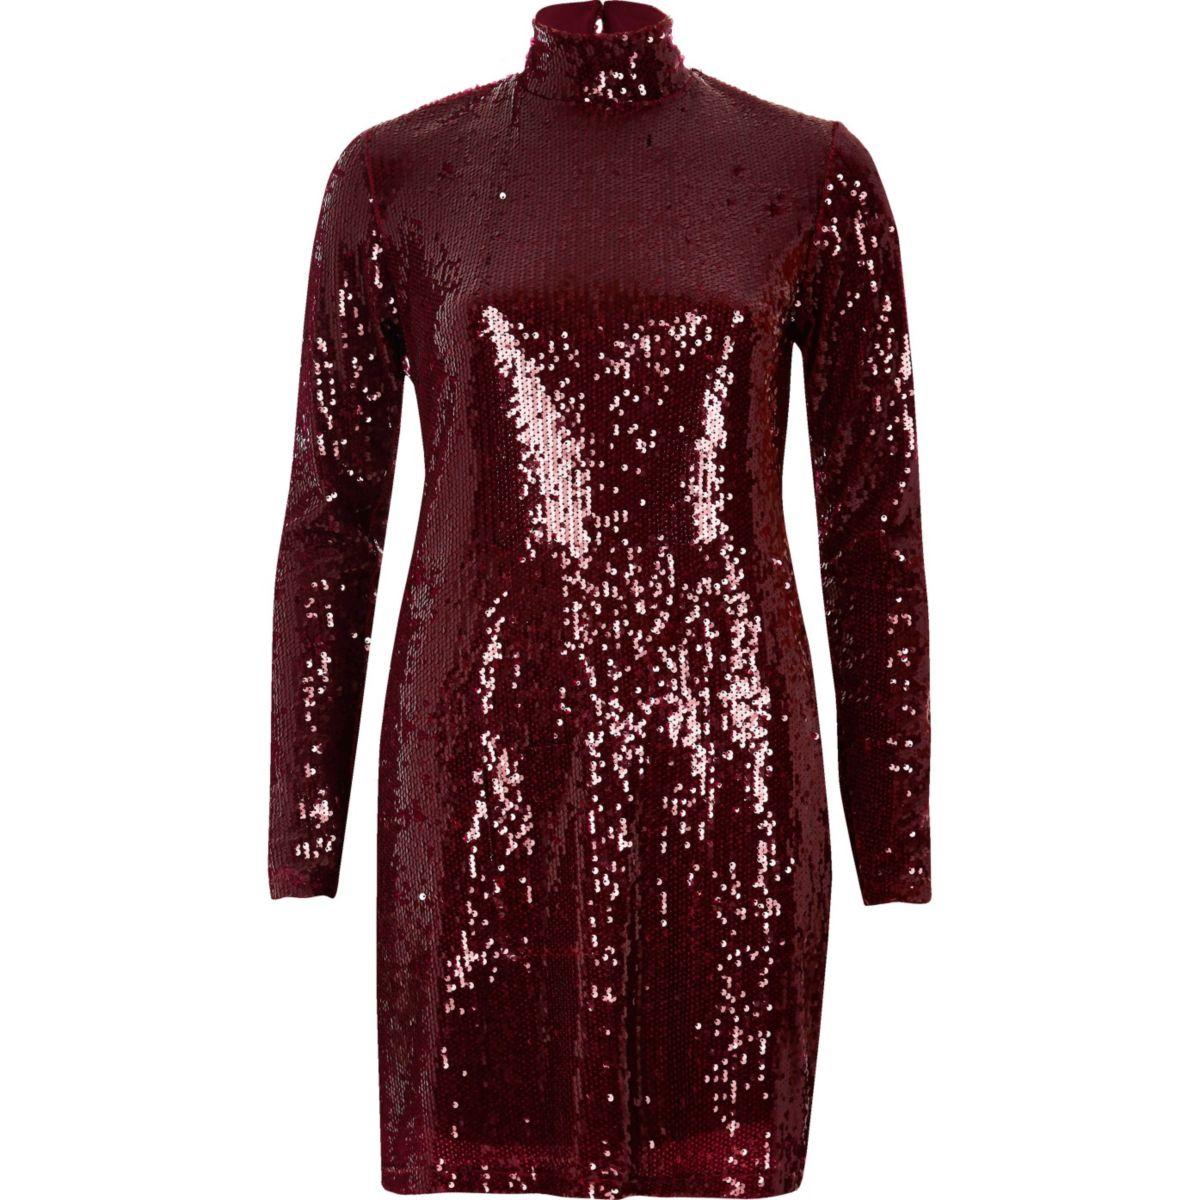 Red turtleneck sequin dress